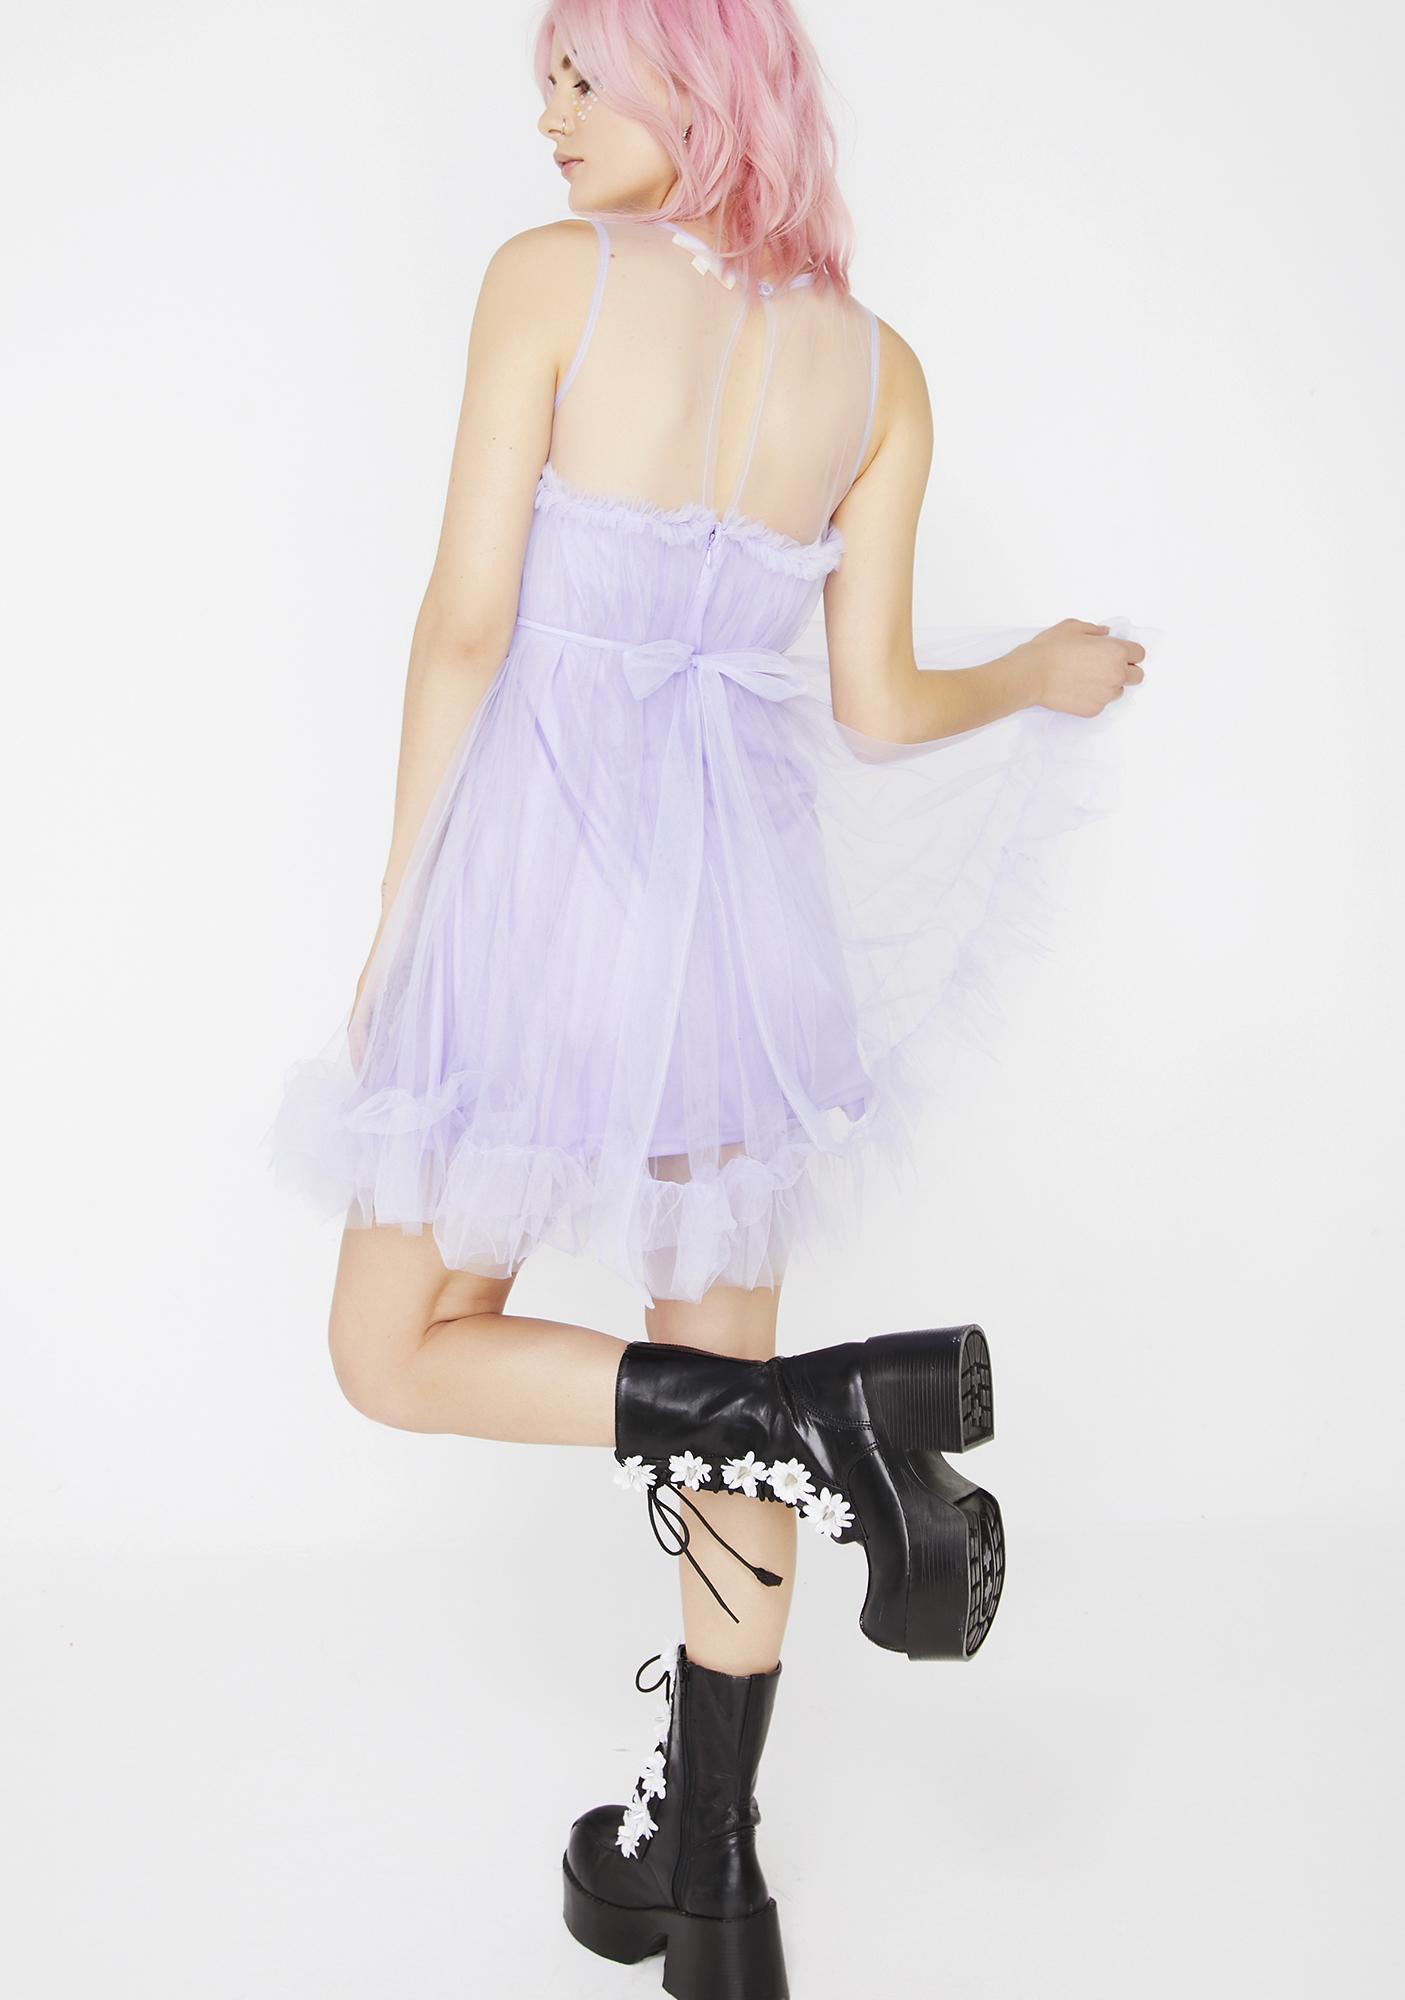 ... Fairy Romantic Splendor Tulle Dress 0359e1f67e